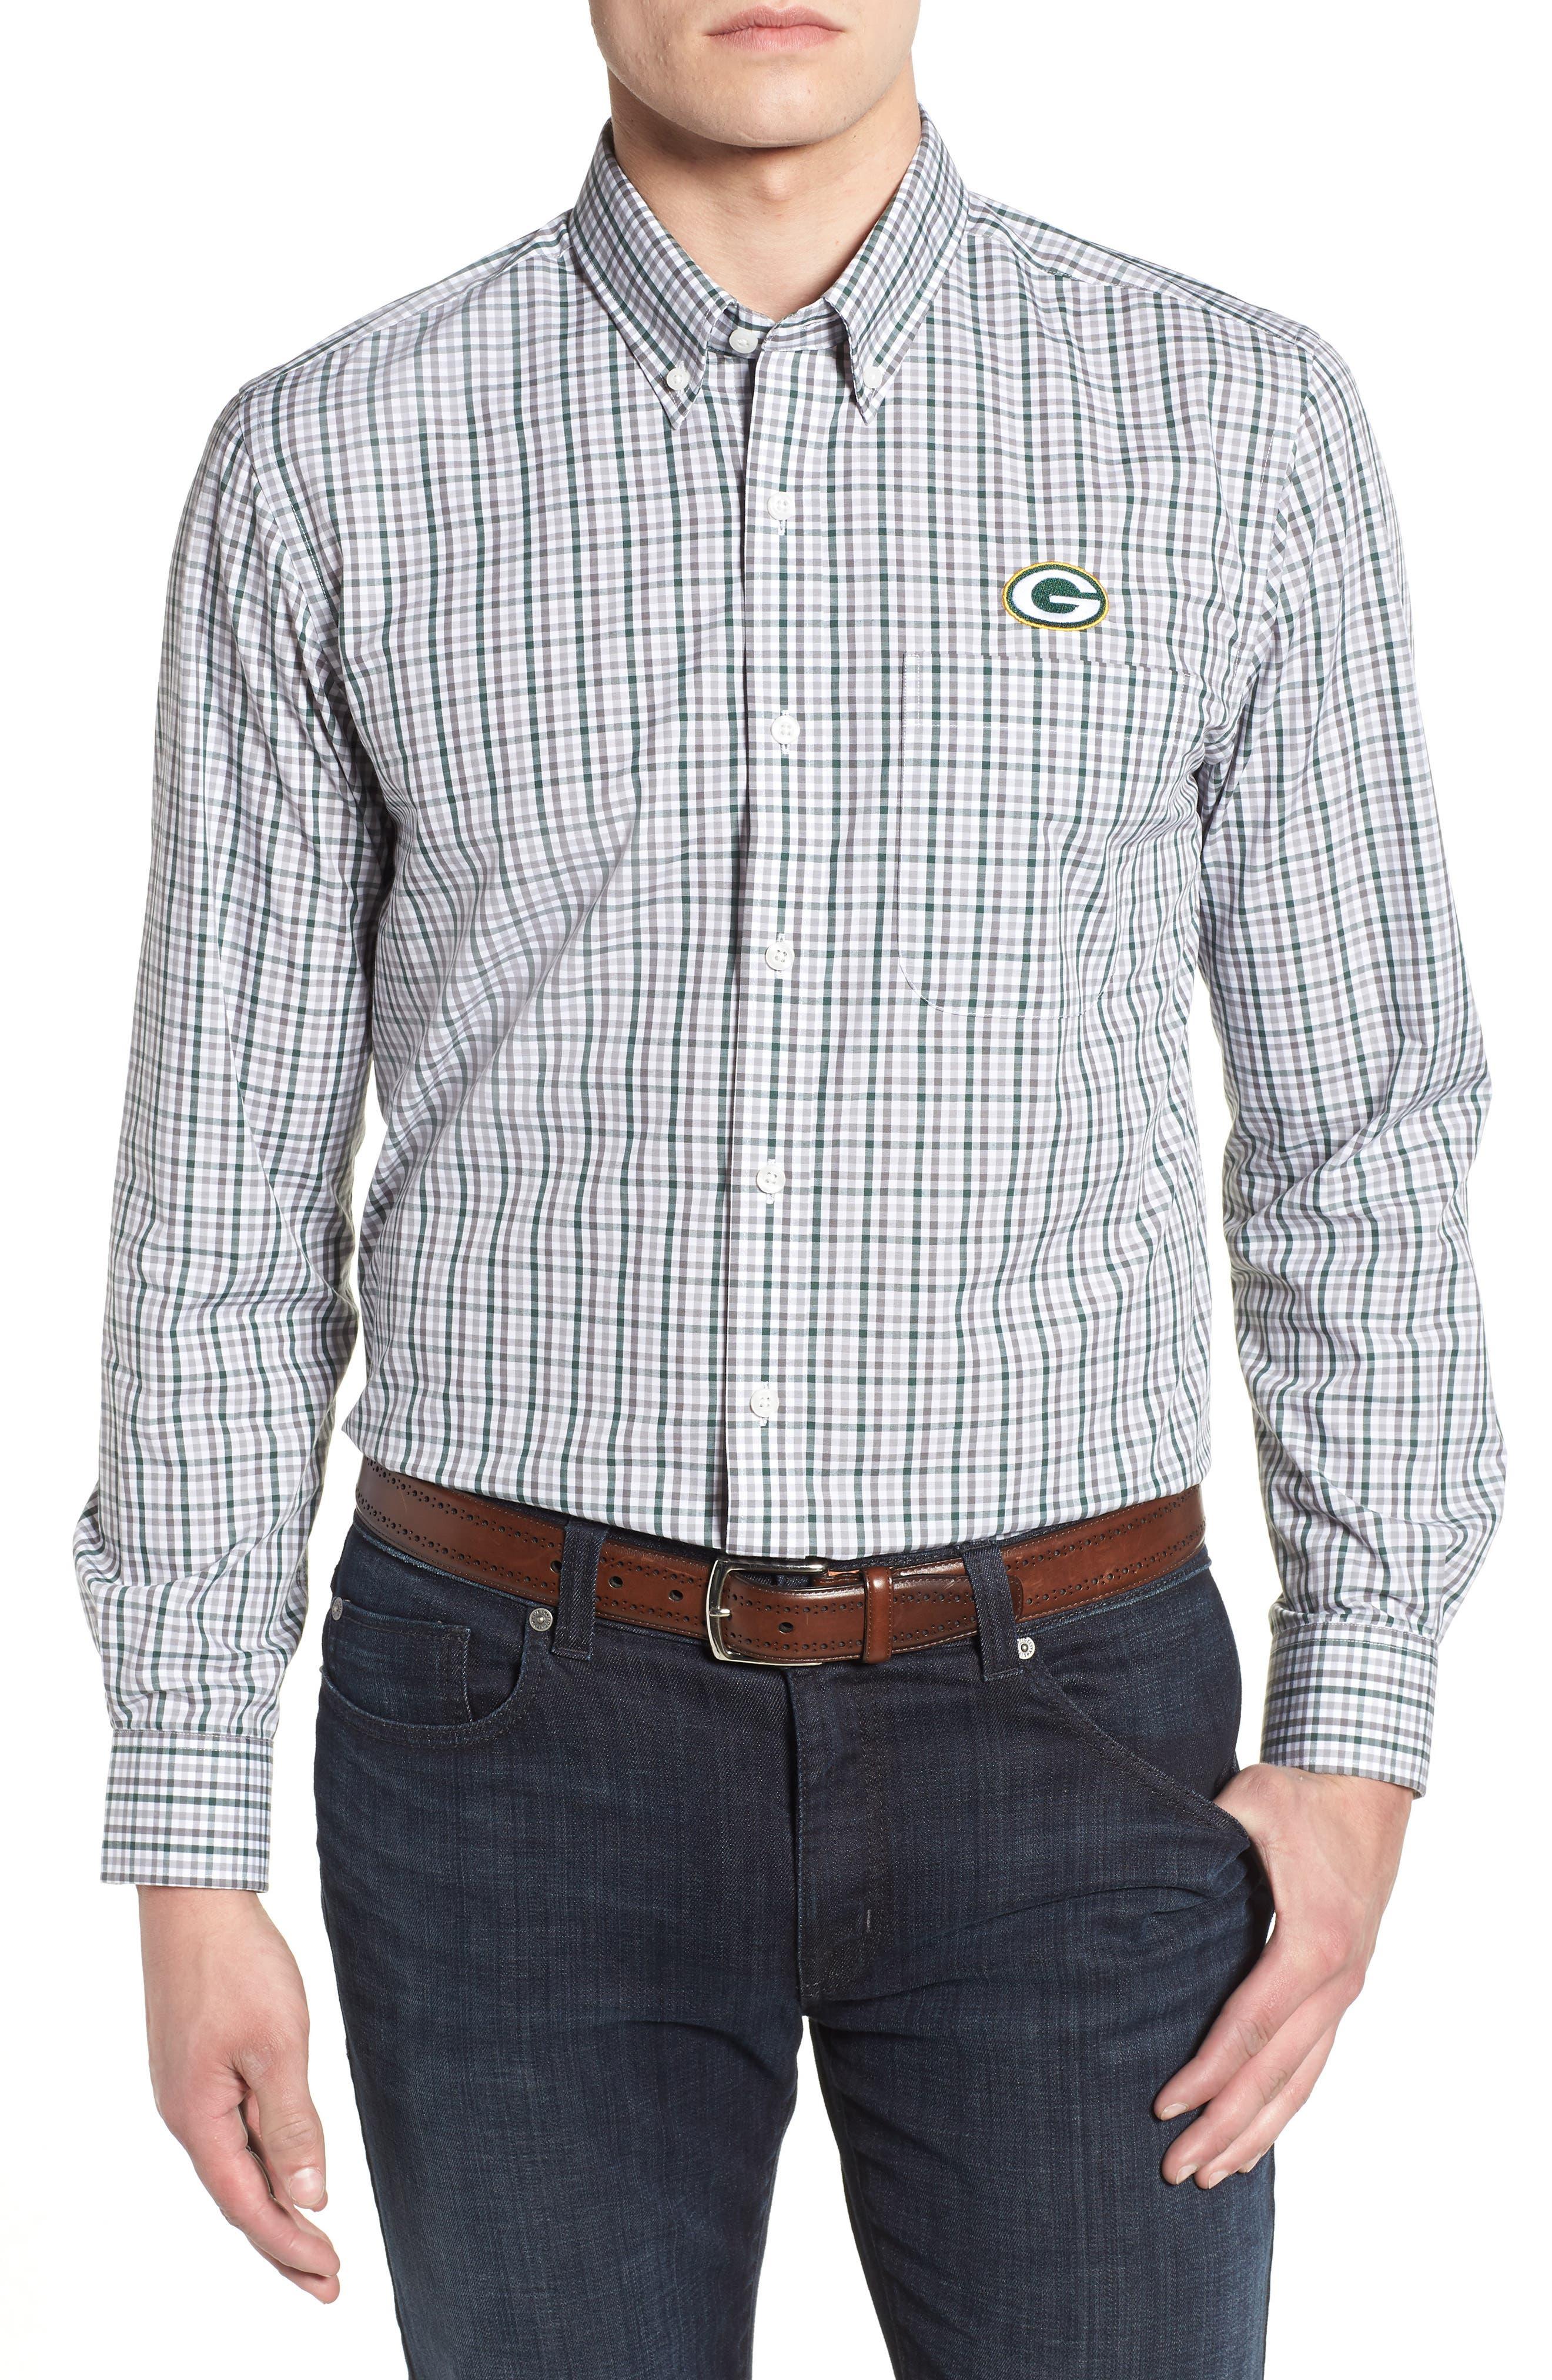 Green Bay Packers - Gilman Regular Fit Plaid Sport Shirt,                             Main thumbnail 1, color,                             HUNTER